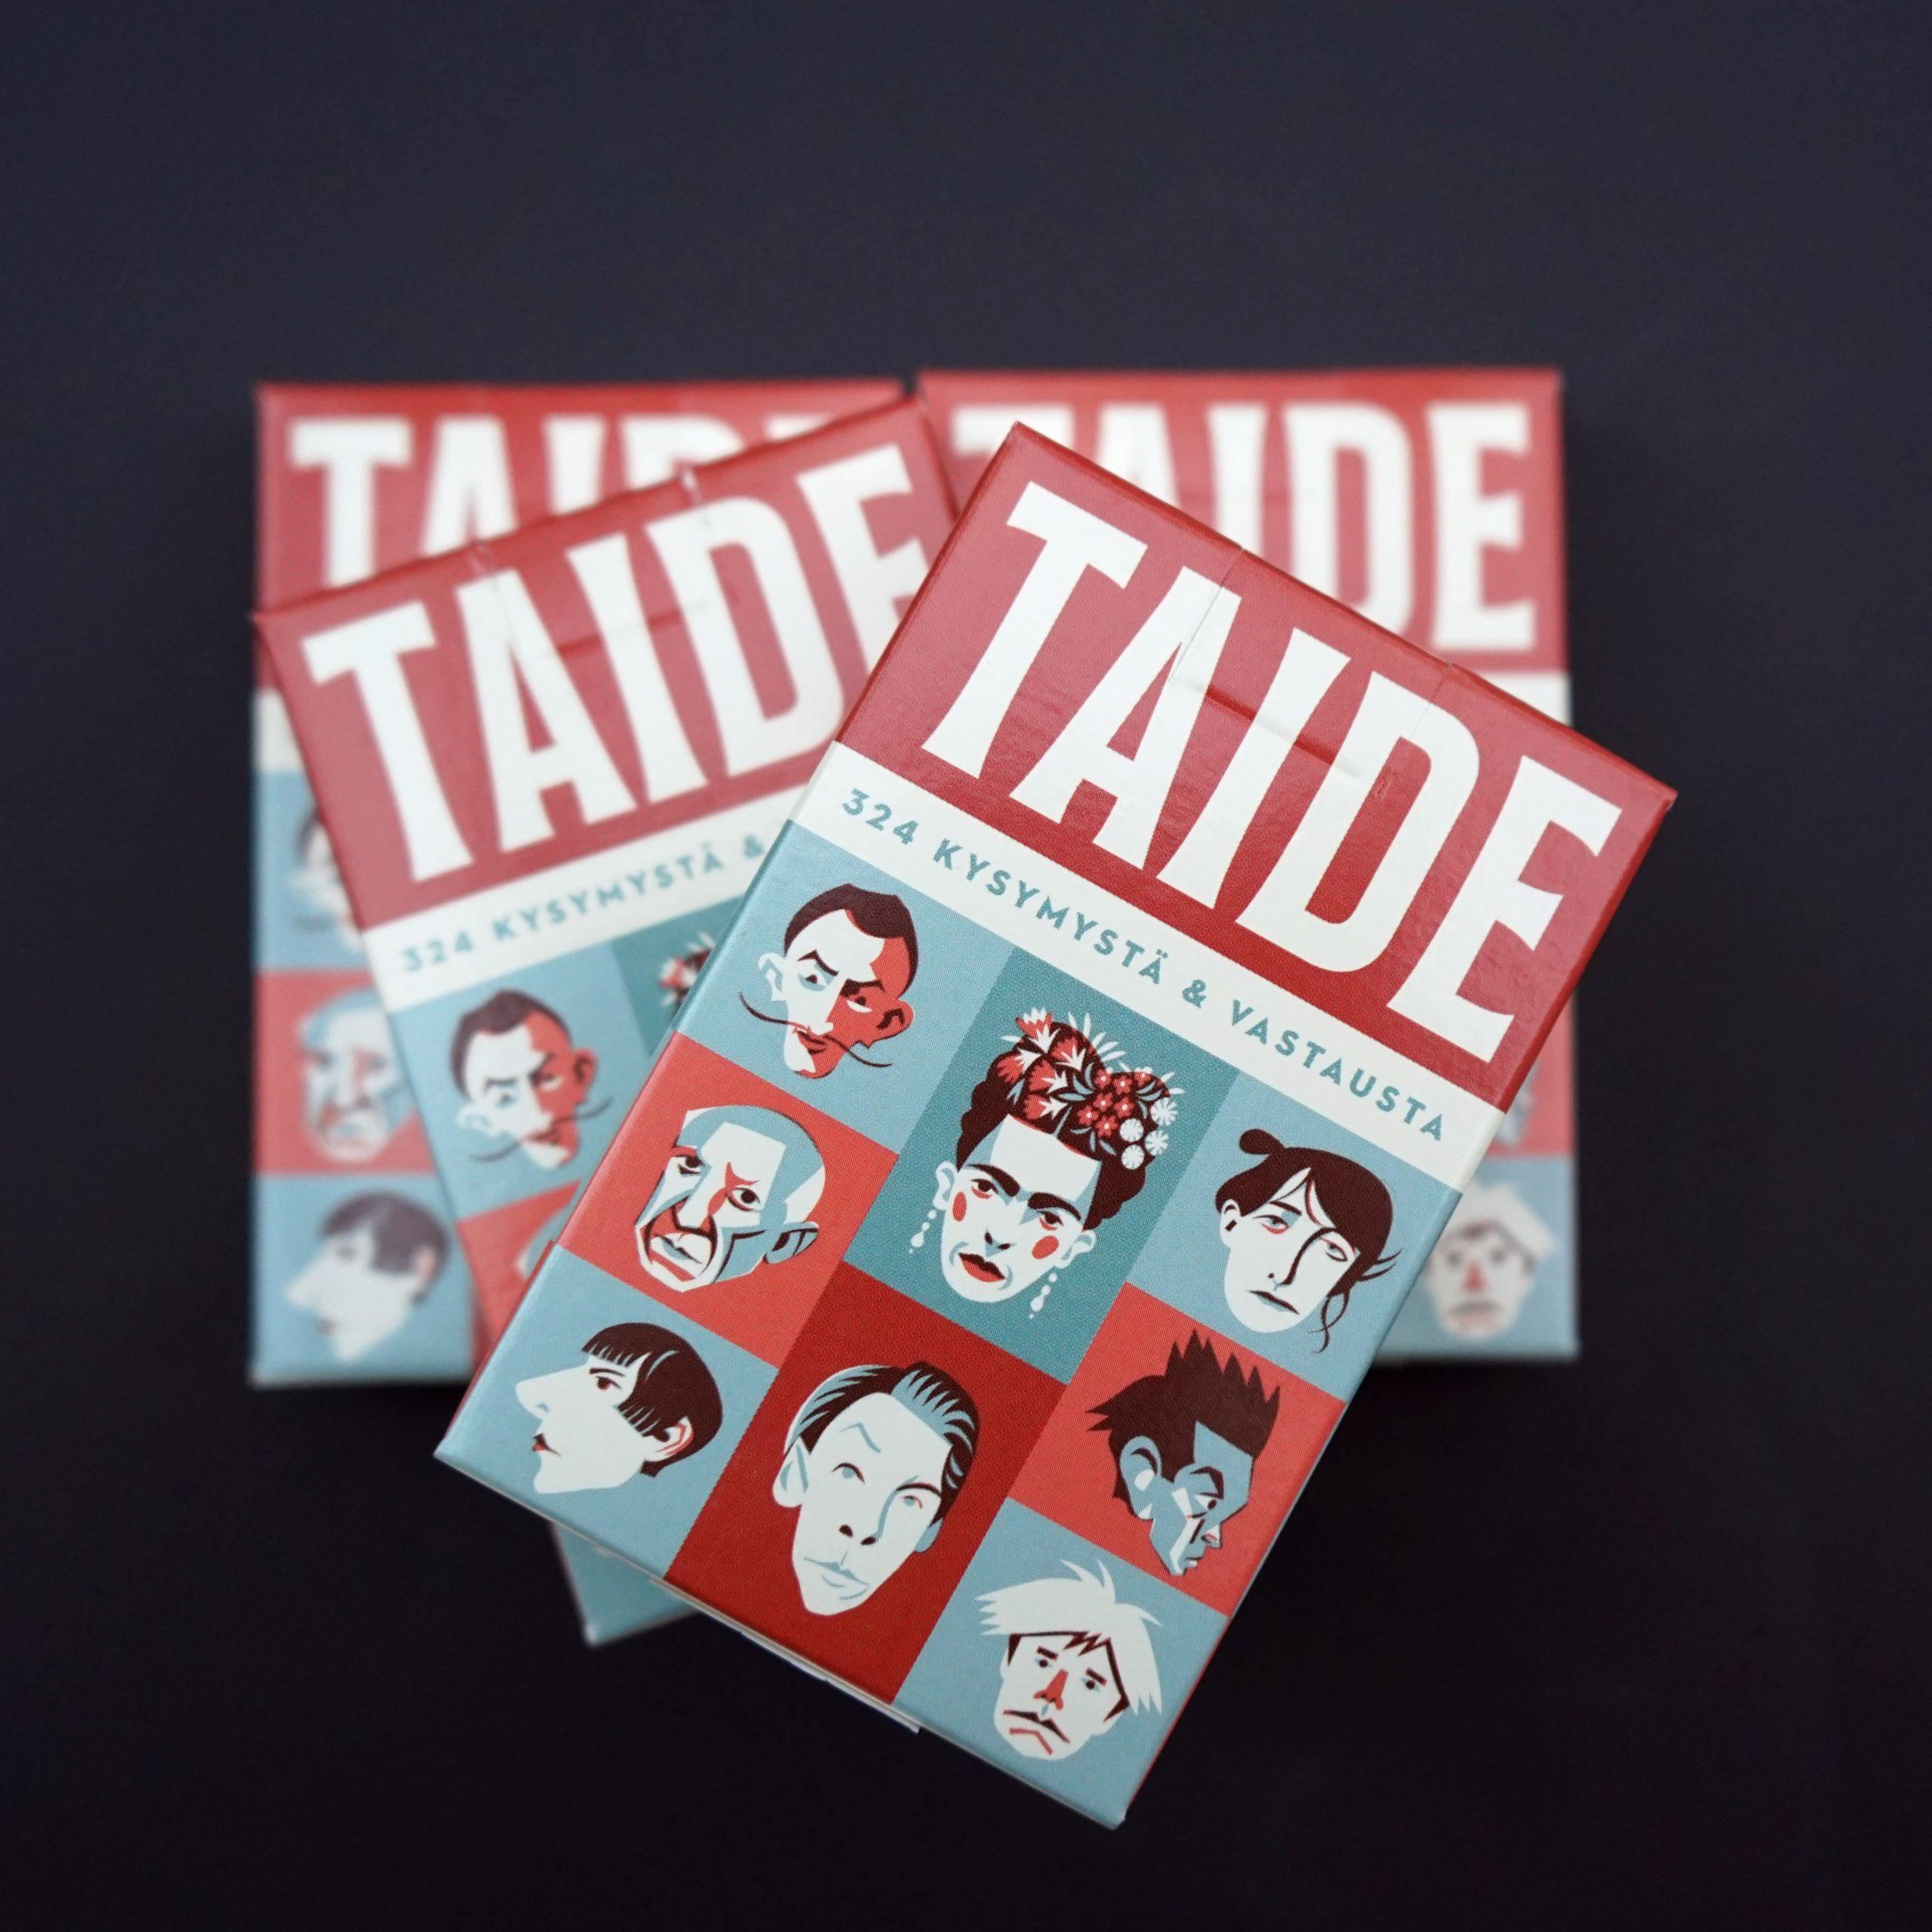 Taide-kysymyskortit (510041)